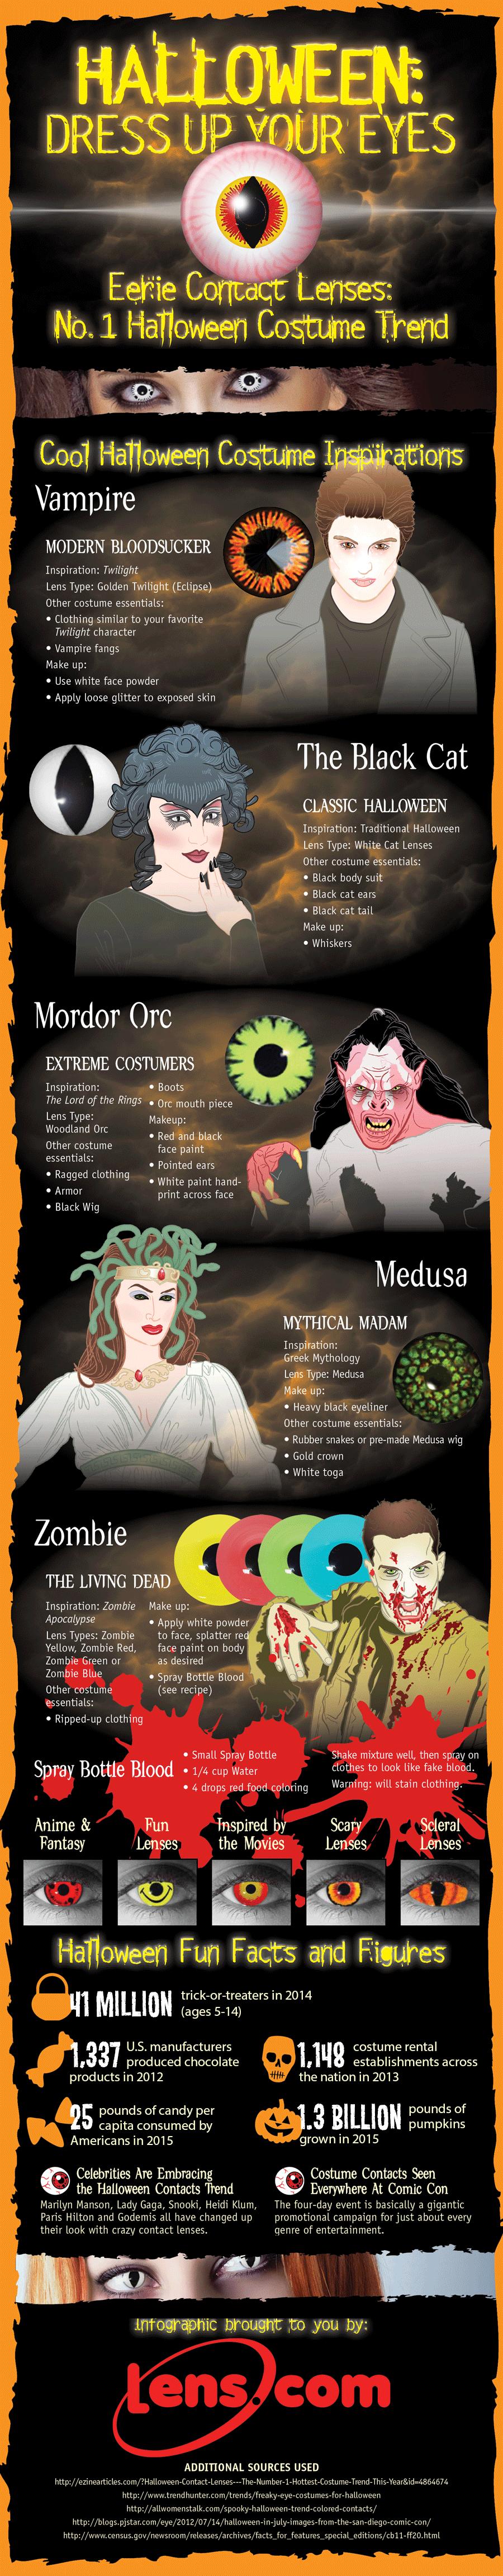 Halloween Costume Ideas by Lens.com